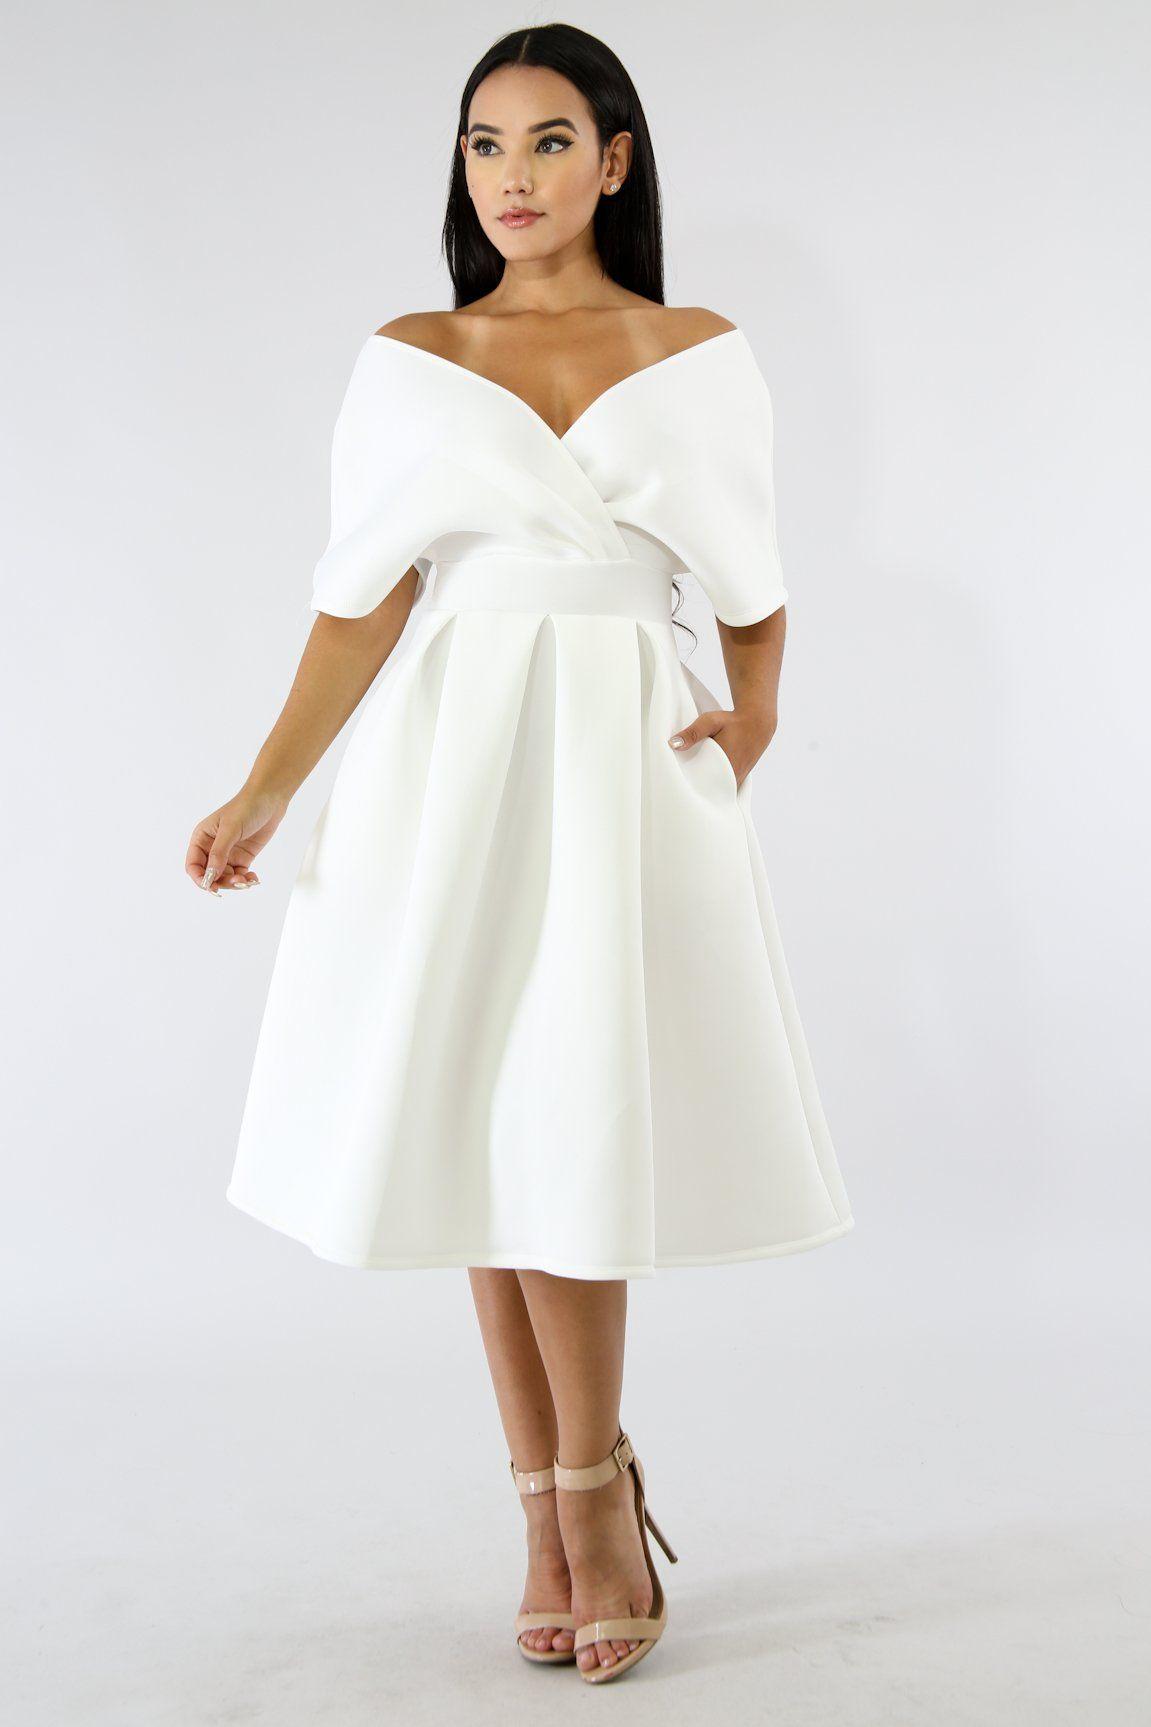 Silver wedding dresses plus size  Elegance Swing Dress  Outfit  Pinterest  Dresses Swing dress and